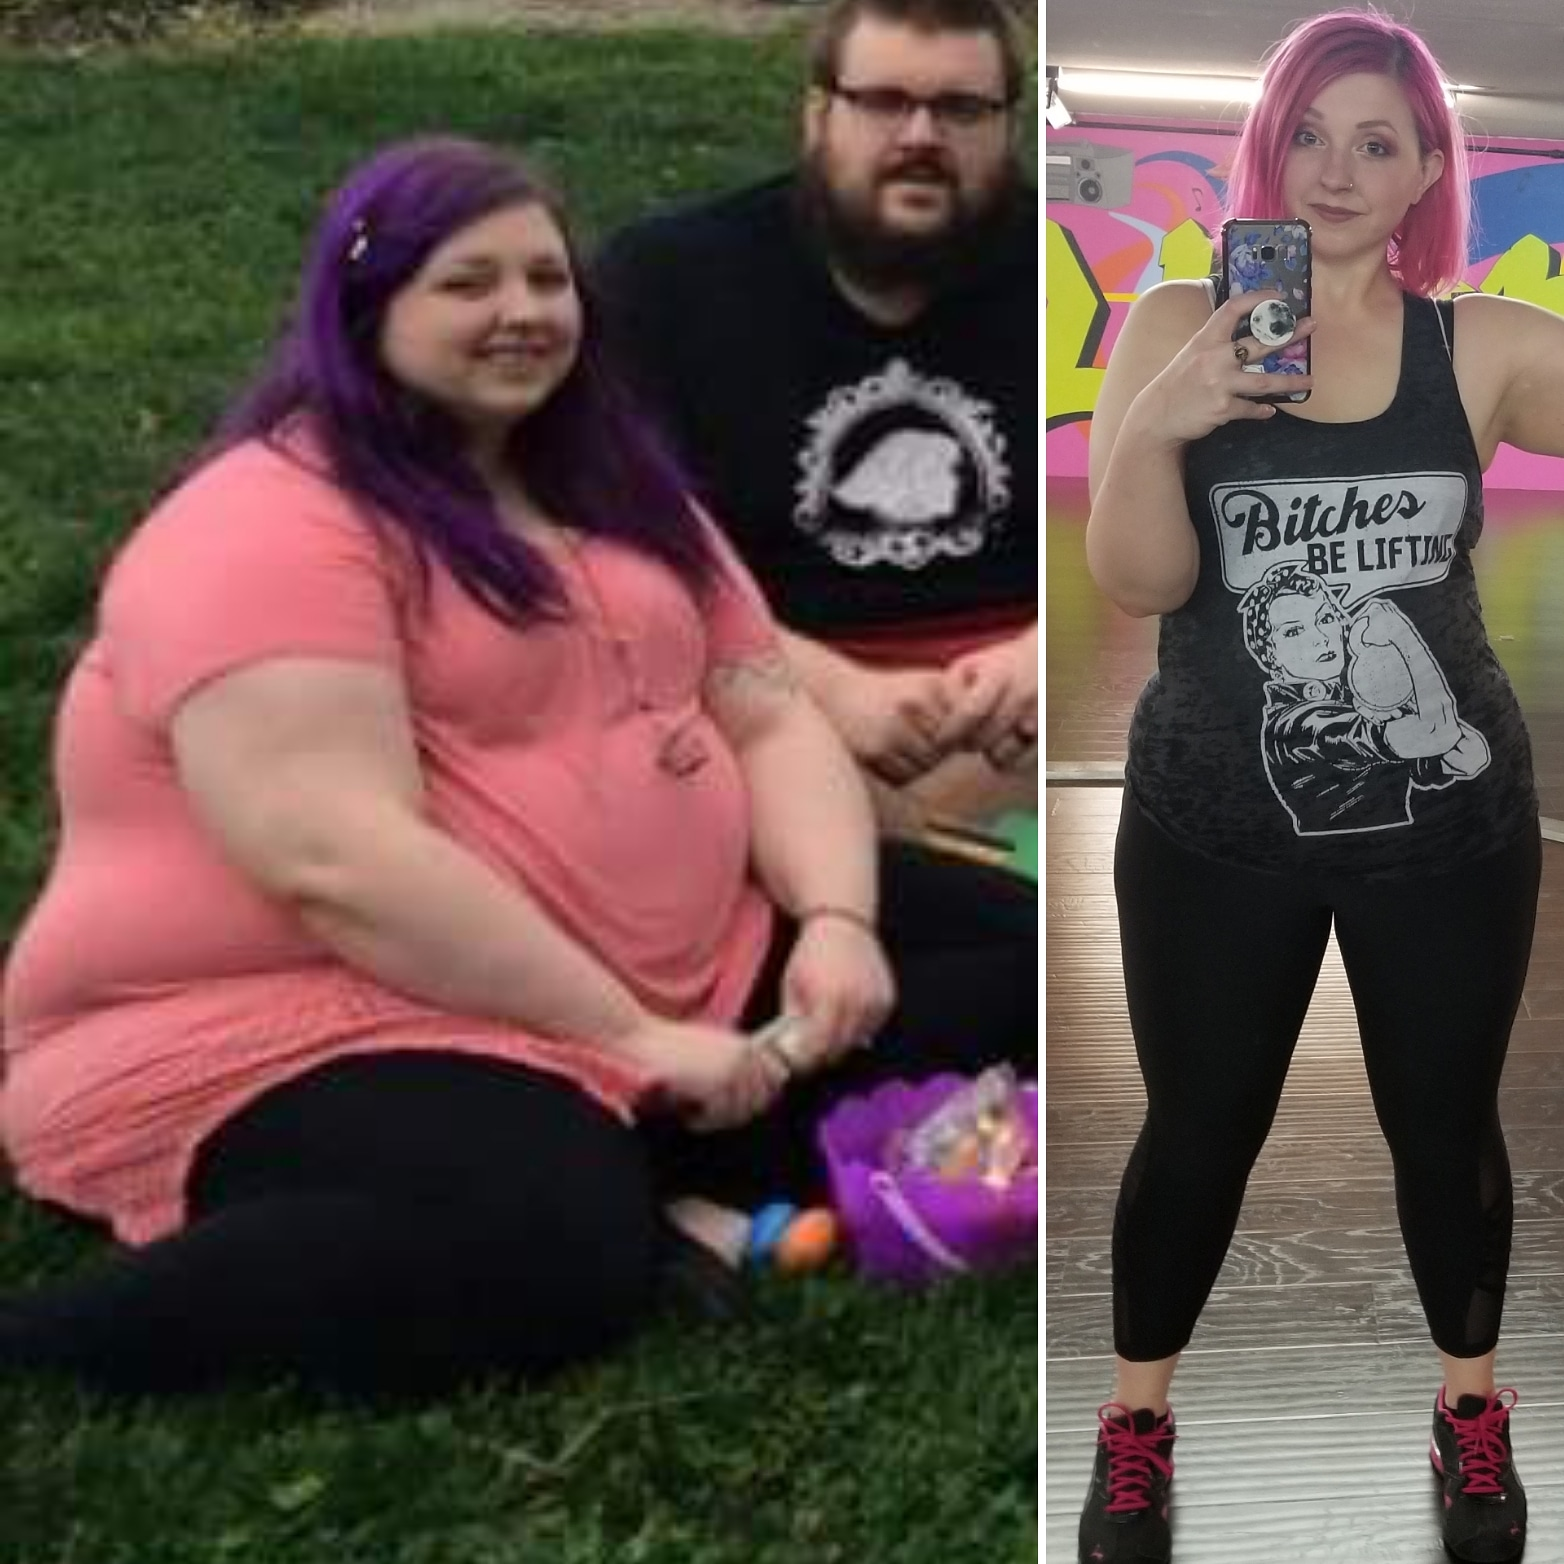 135 lbs Weight Loss 5'8 Female 350 lbs to 215 lbs